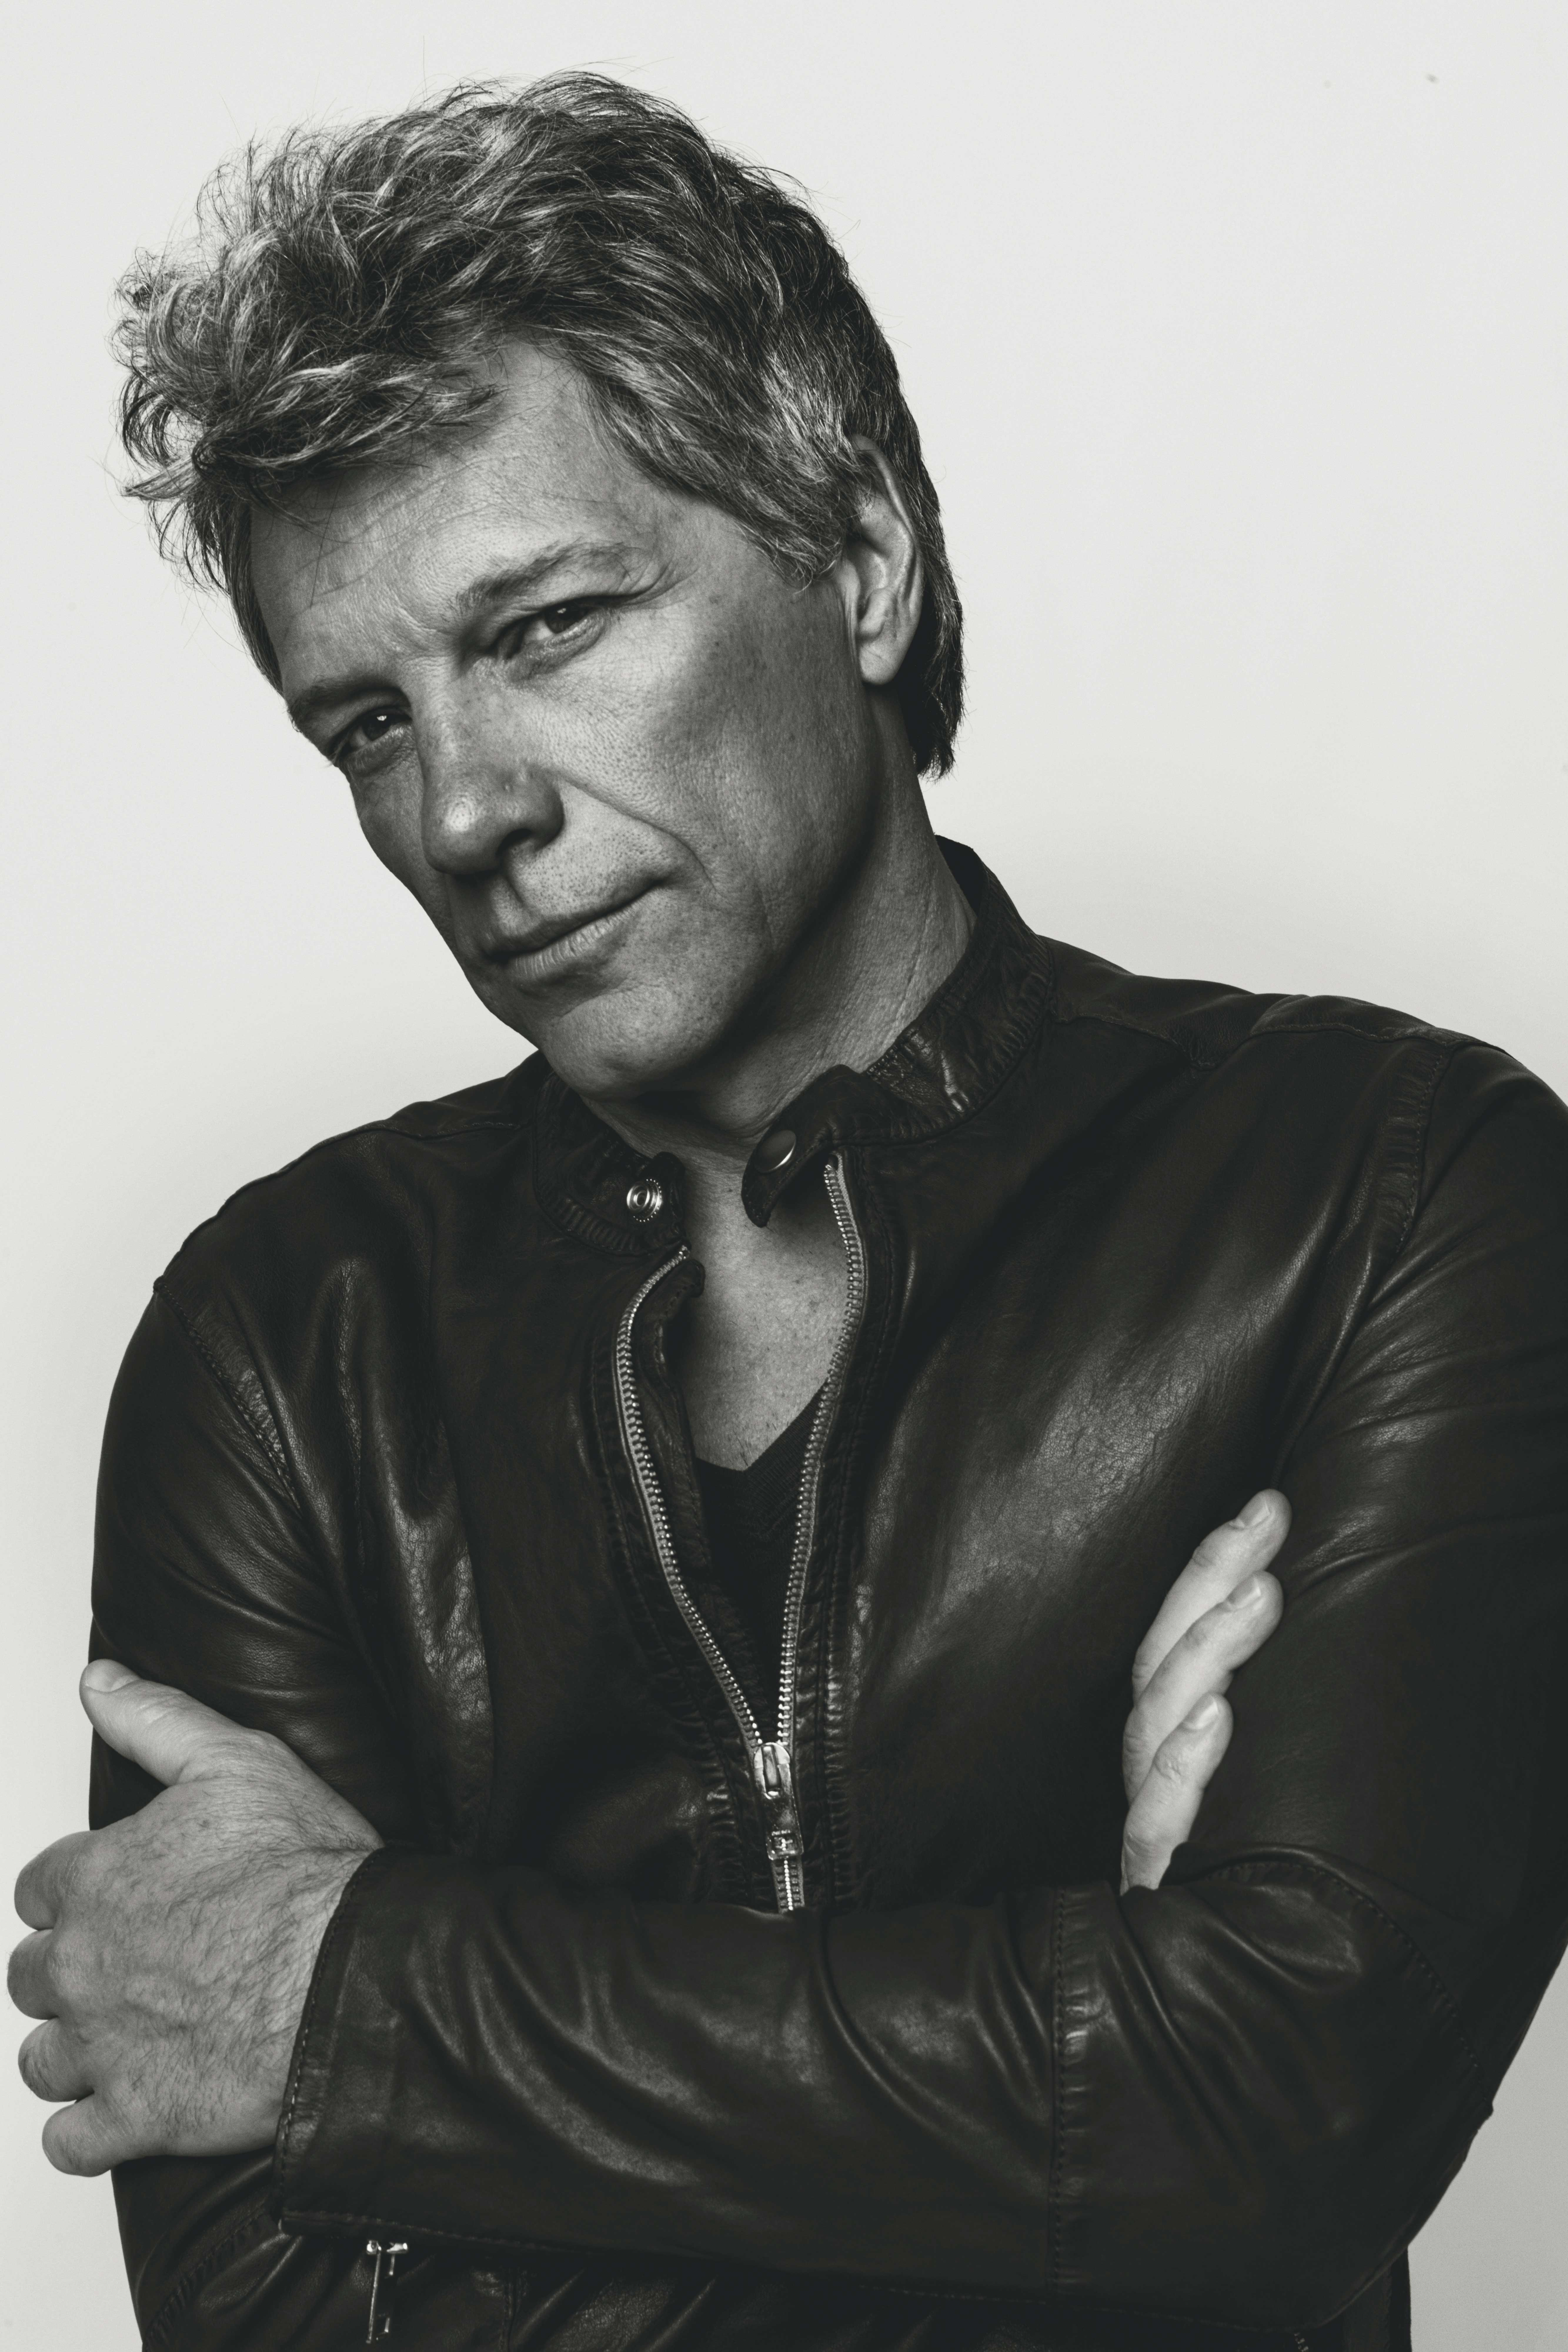 Jon Bon Jovi to Receive NABEF Service to America Leadership Award | NAB Education Foundation